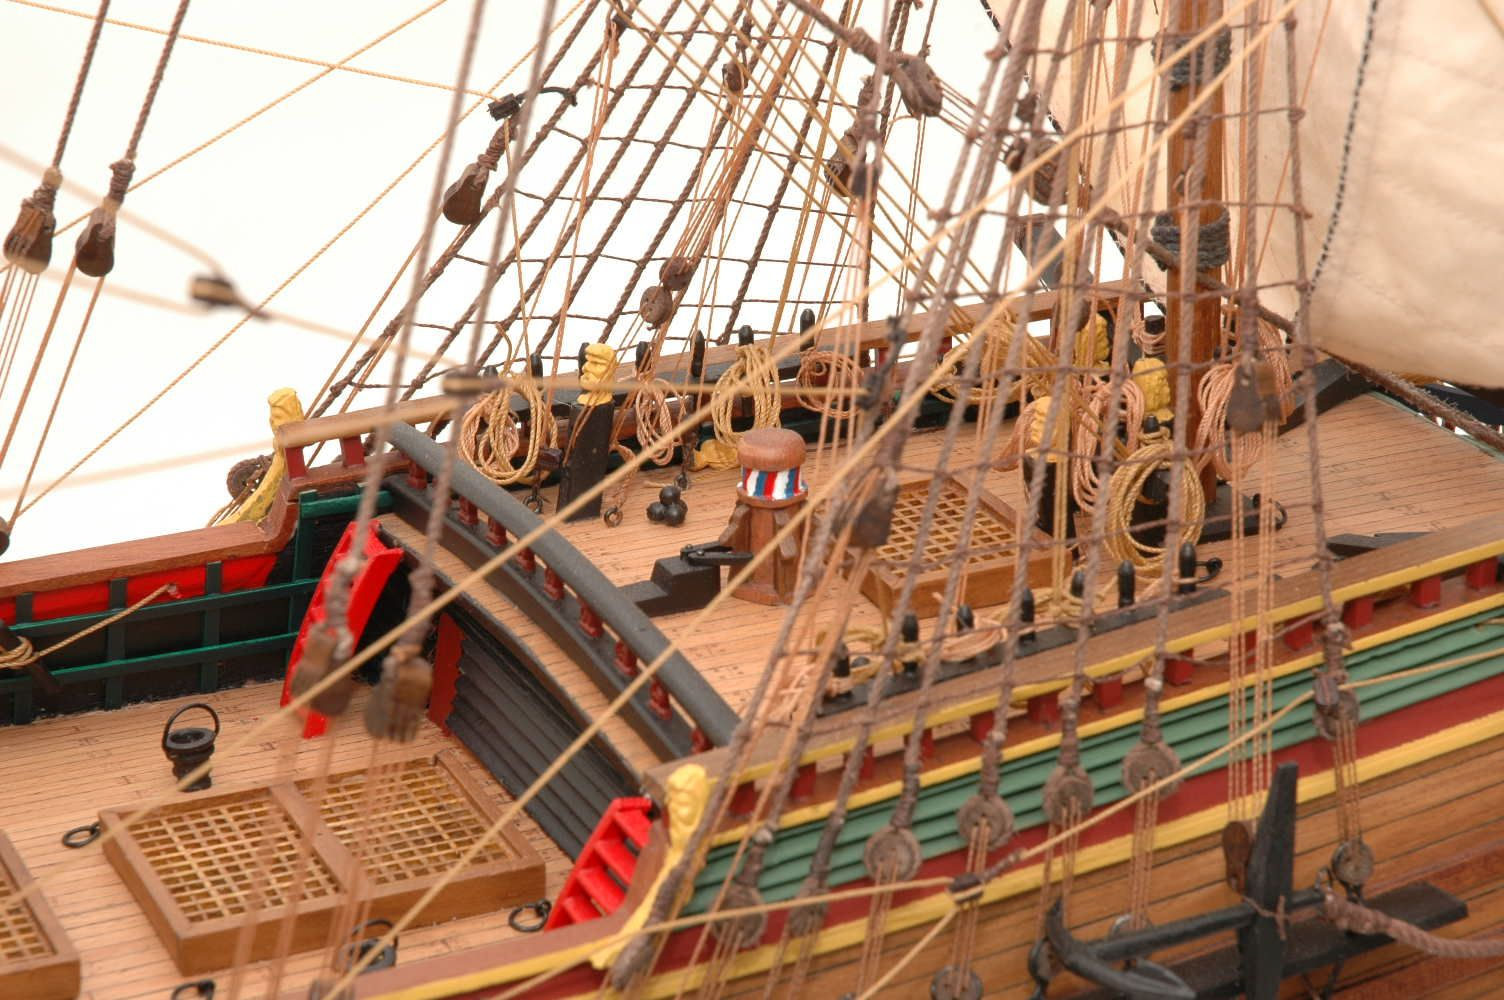 228-6949-Batavia-model-ship-Premier-Range